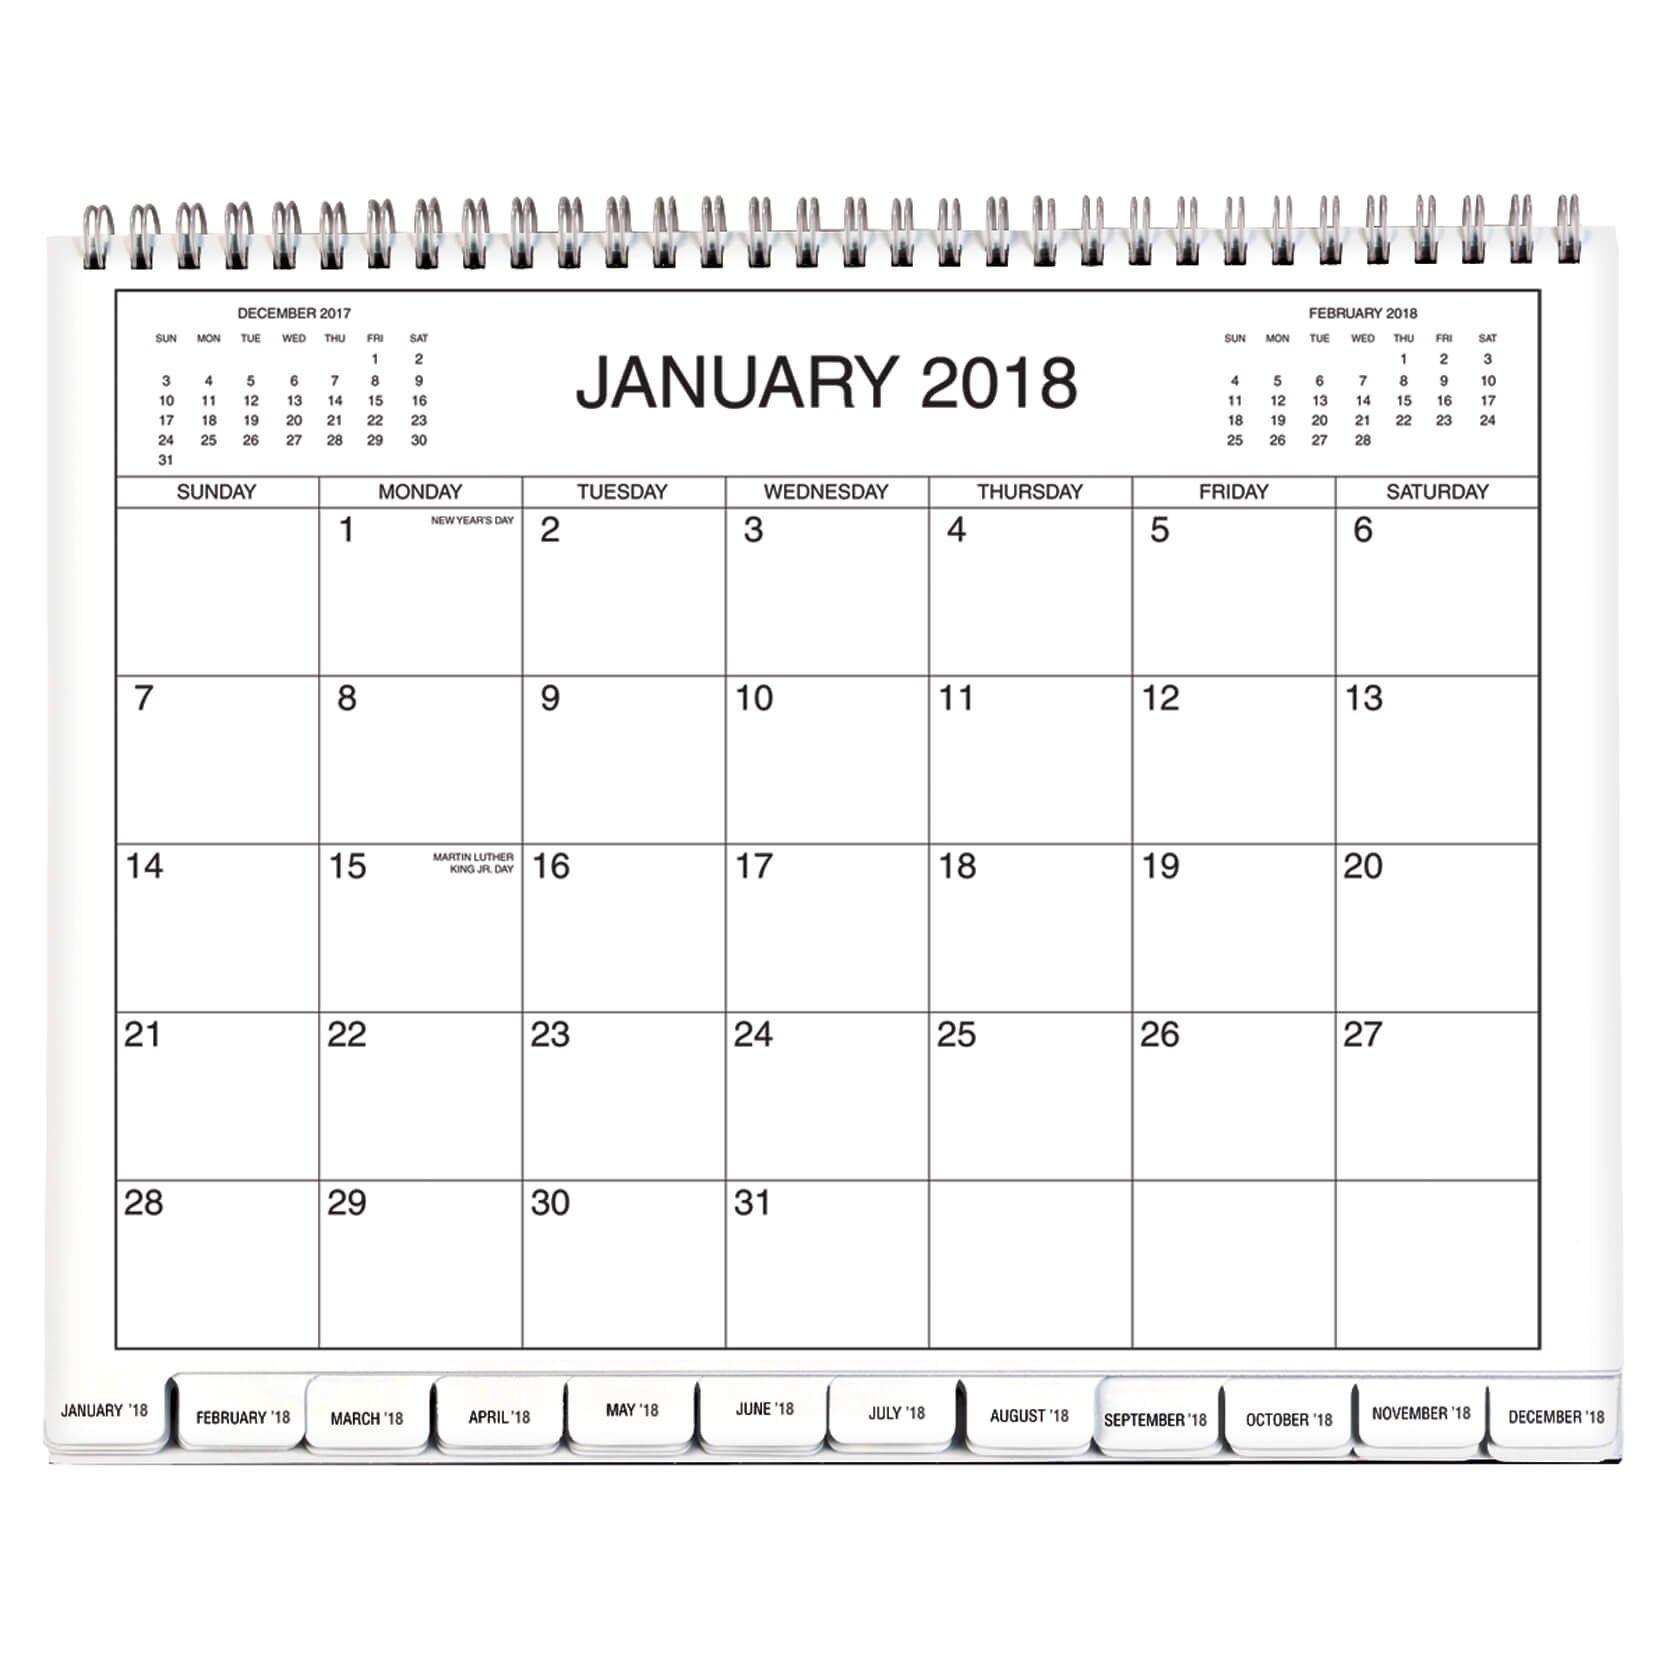 Calendar Template Design - Design Calendar intended for Retail 4 5 4 Calendar 2022